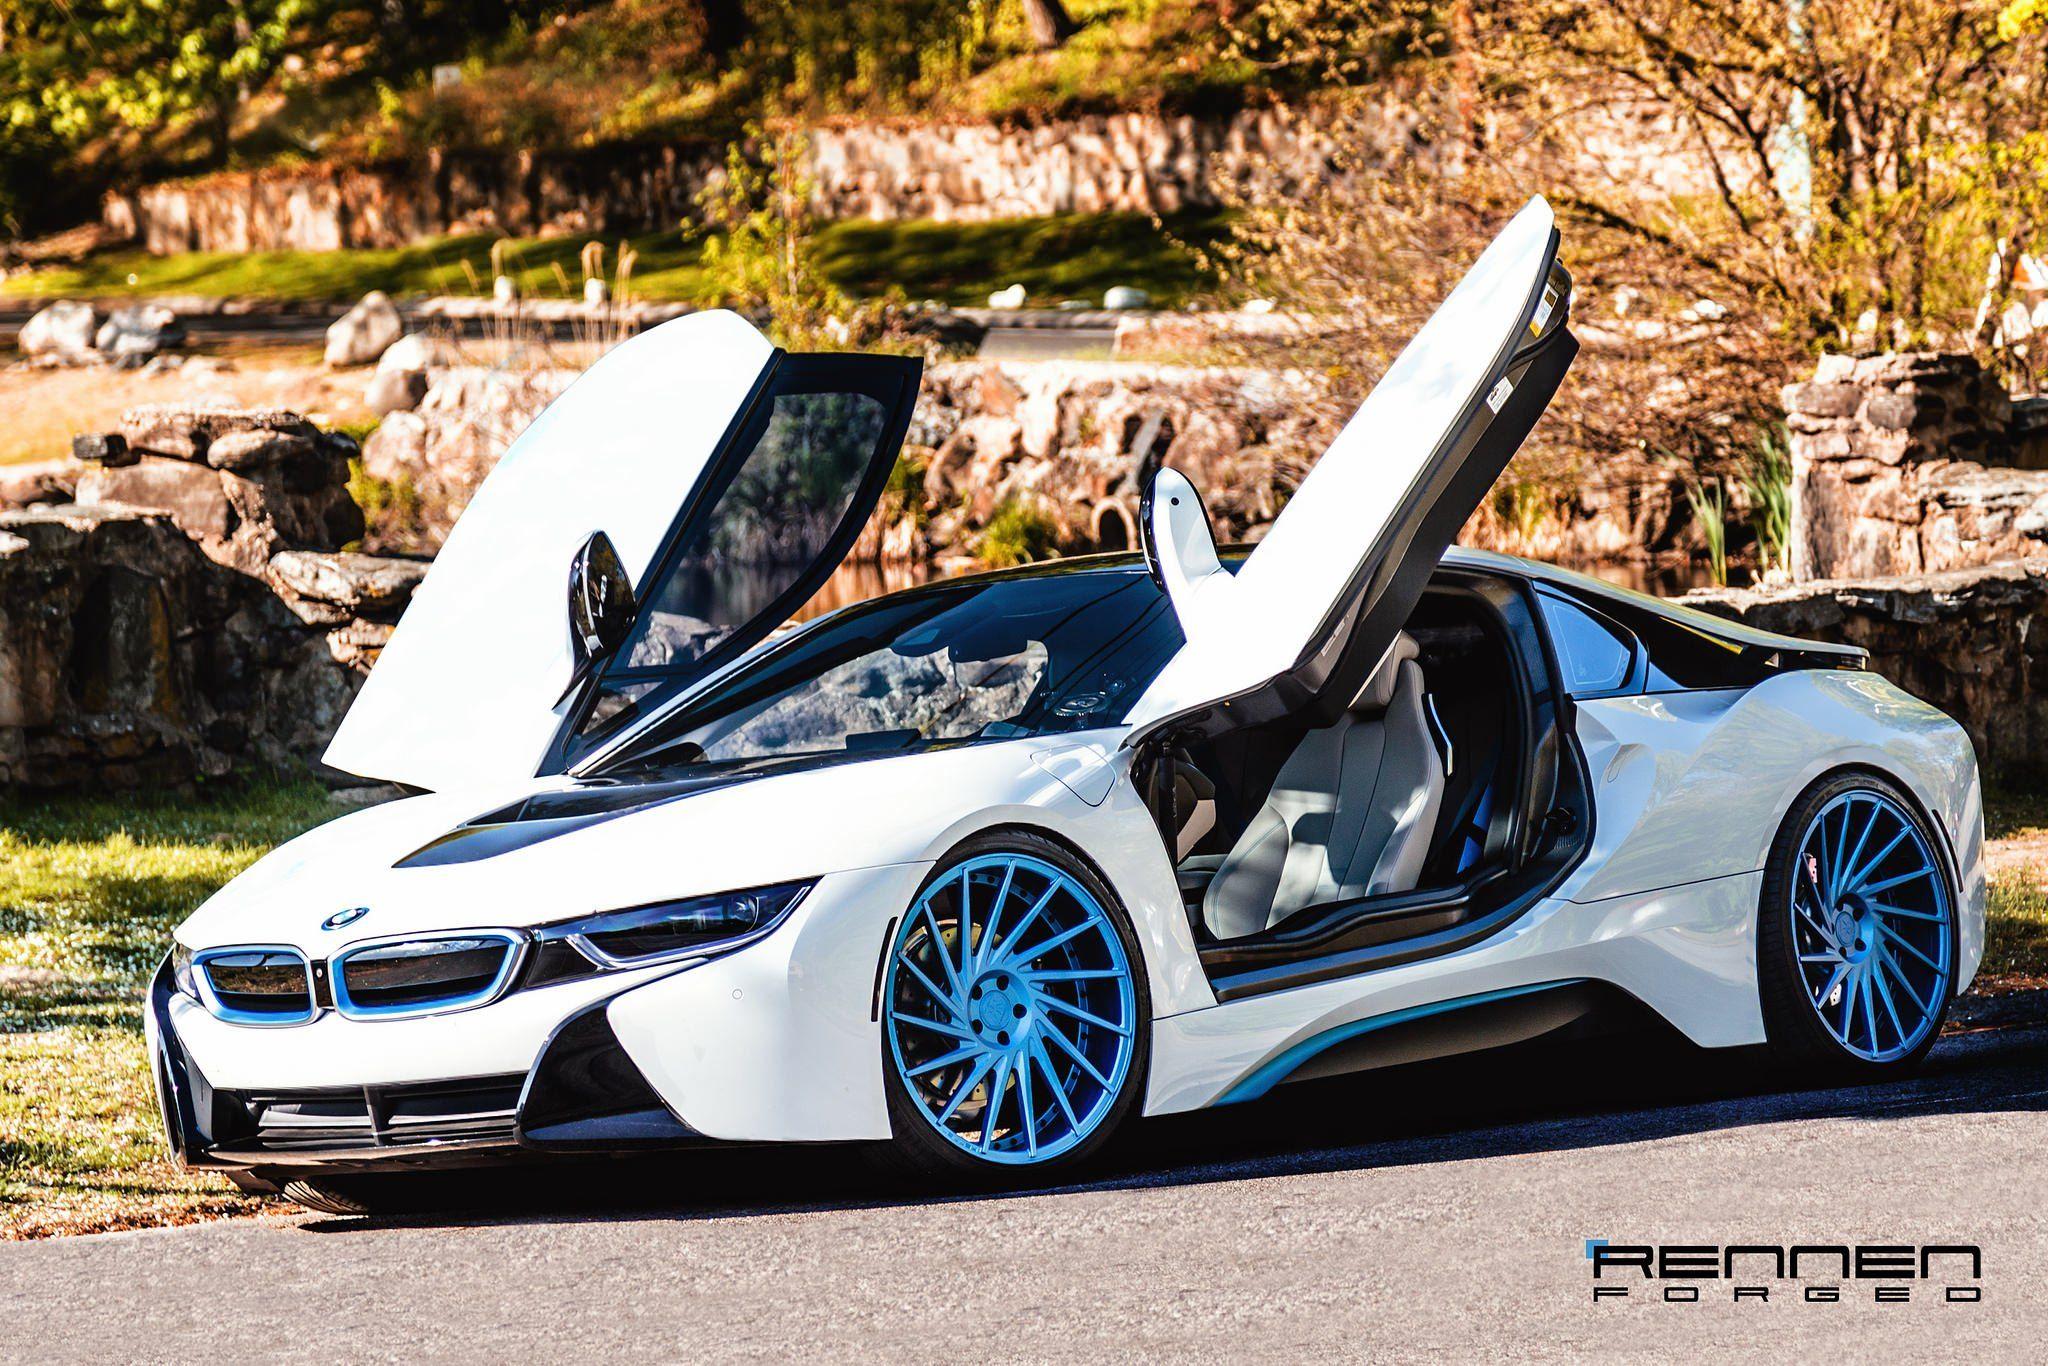 Revolutionary Machine White BMW i8 on Blue Rennen